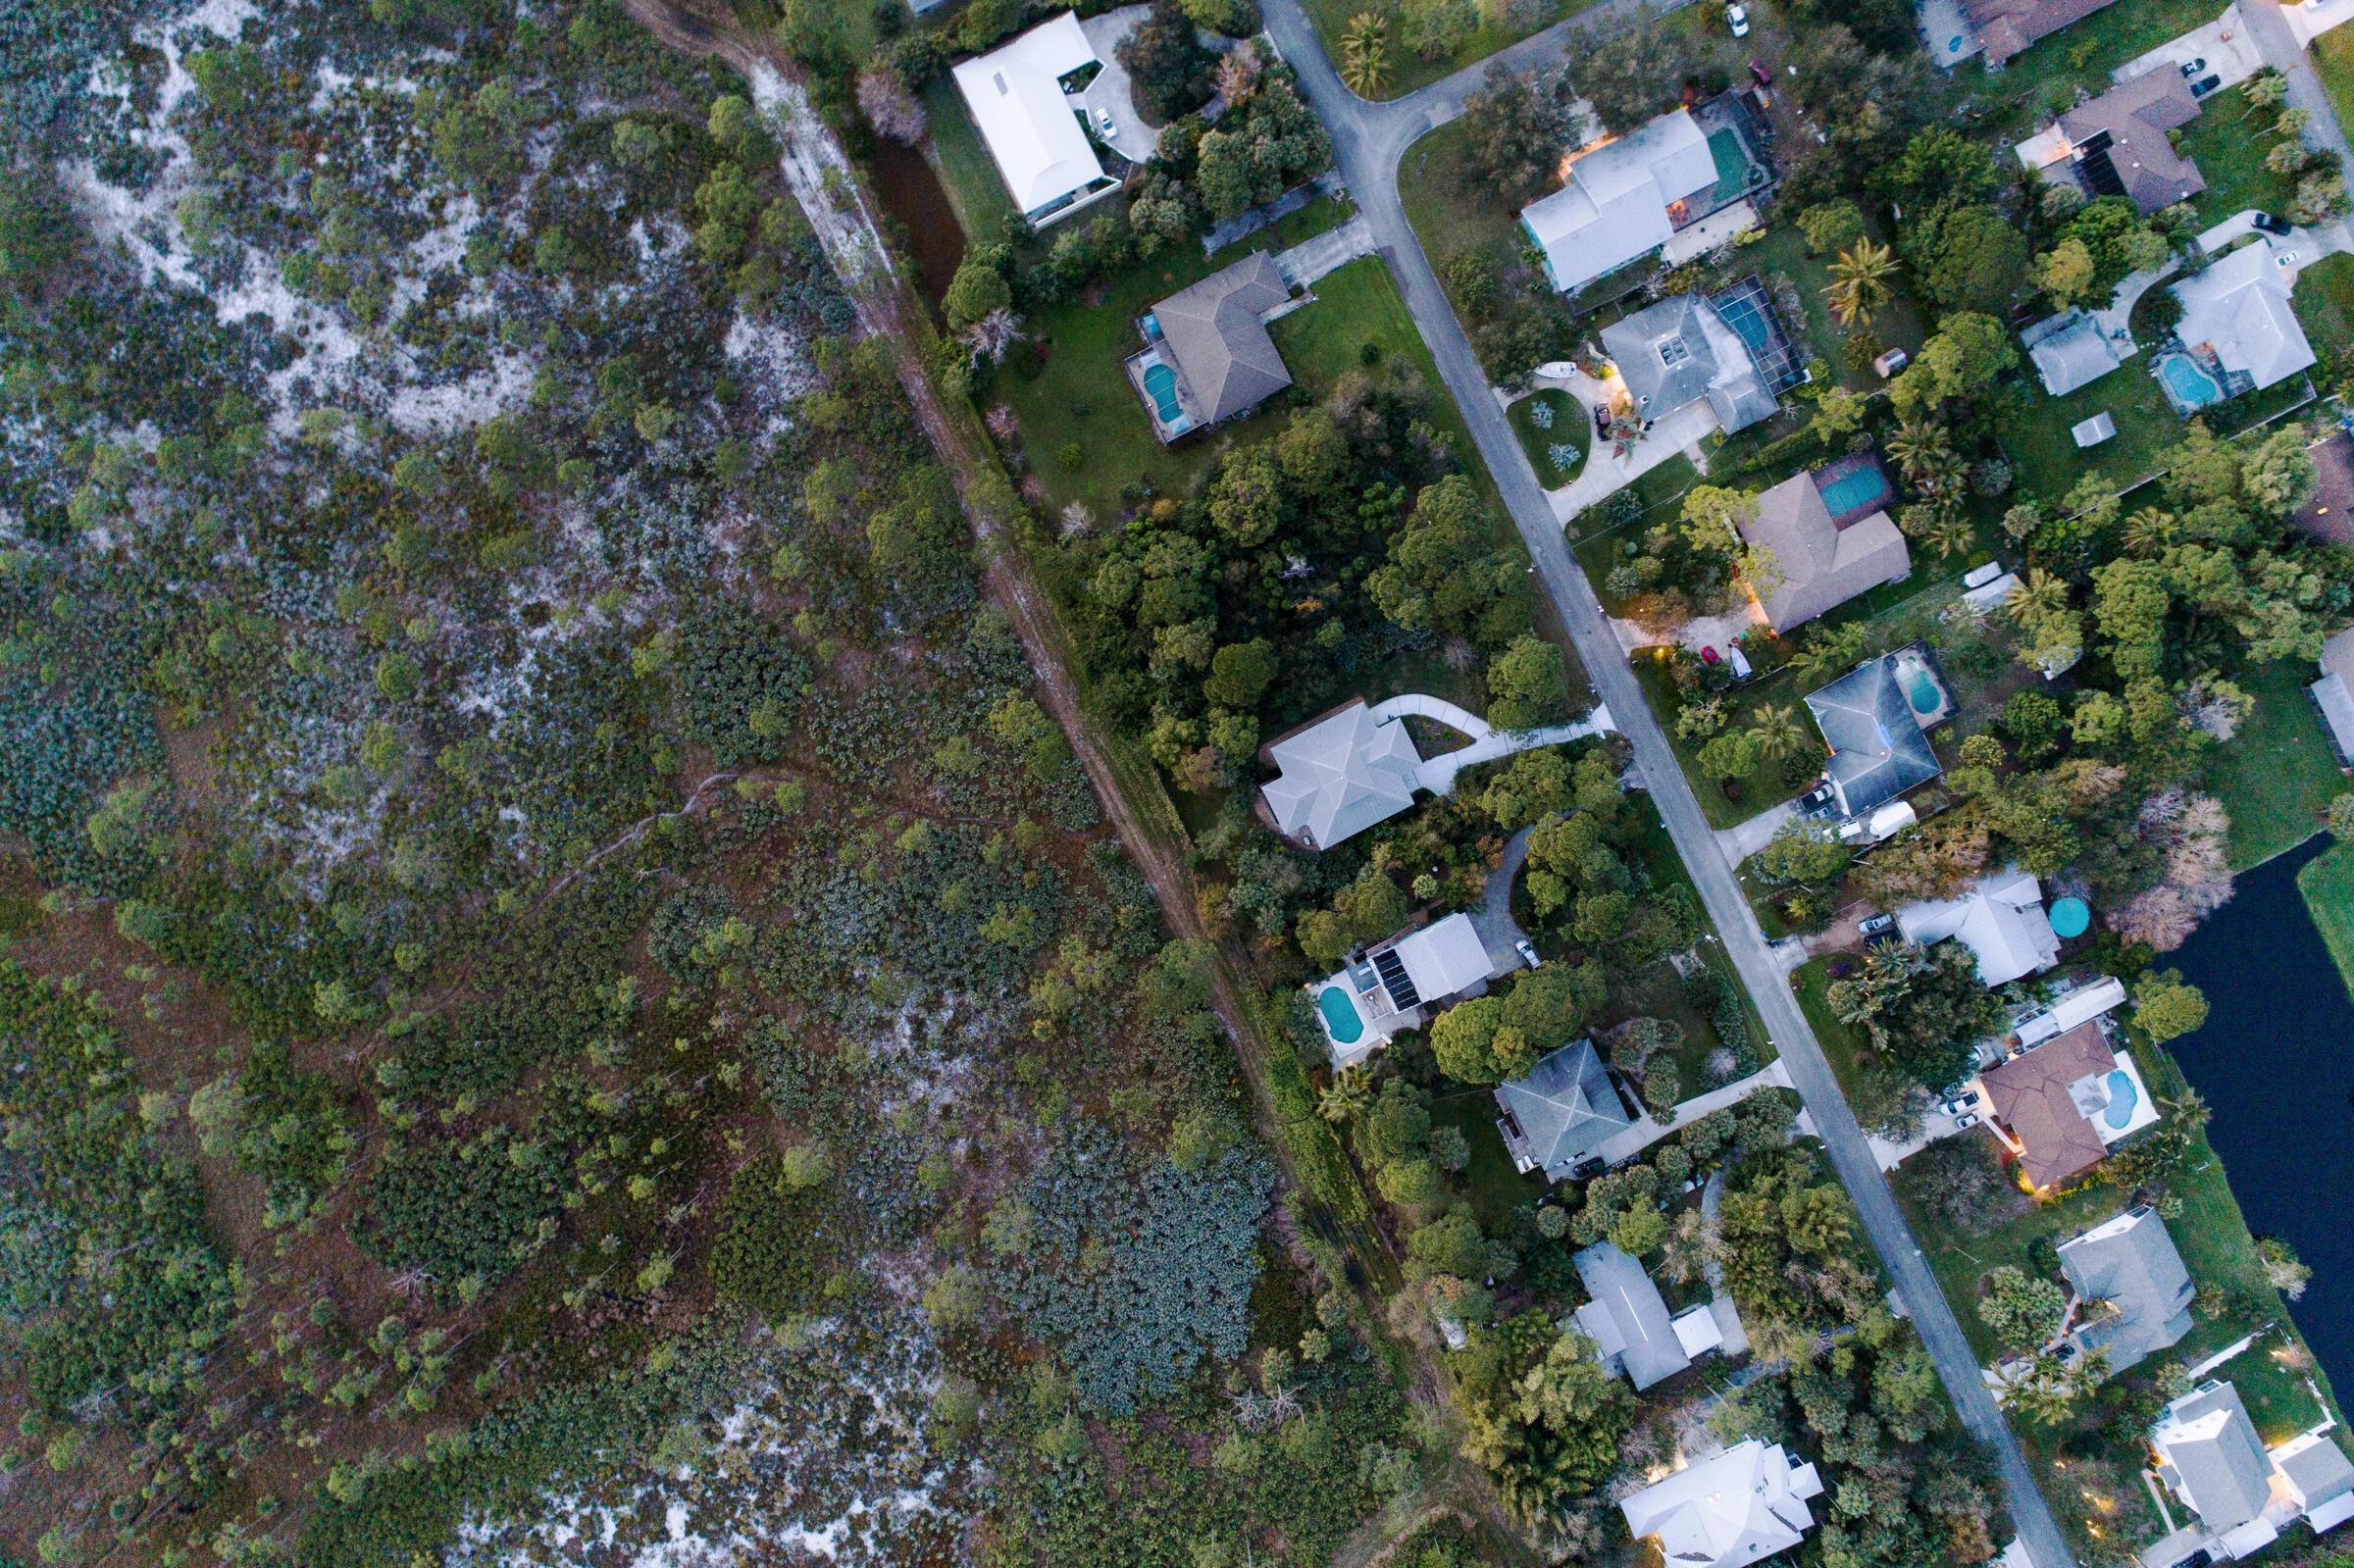 A housing development abuts Jonathan Dickinson's white sand and scrub habitat. Carlton Ward Jr.